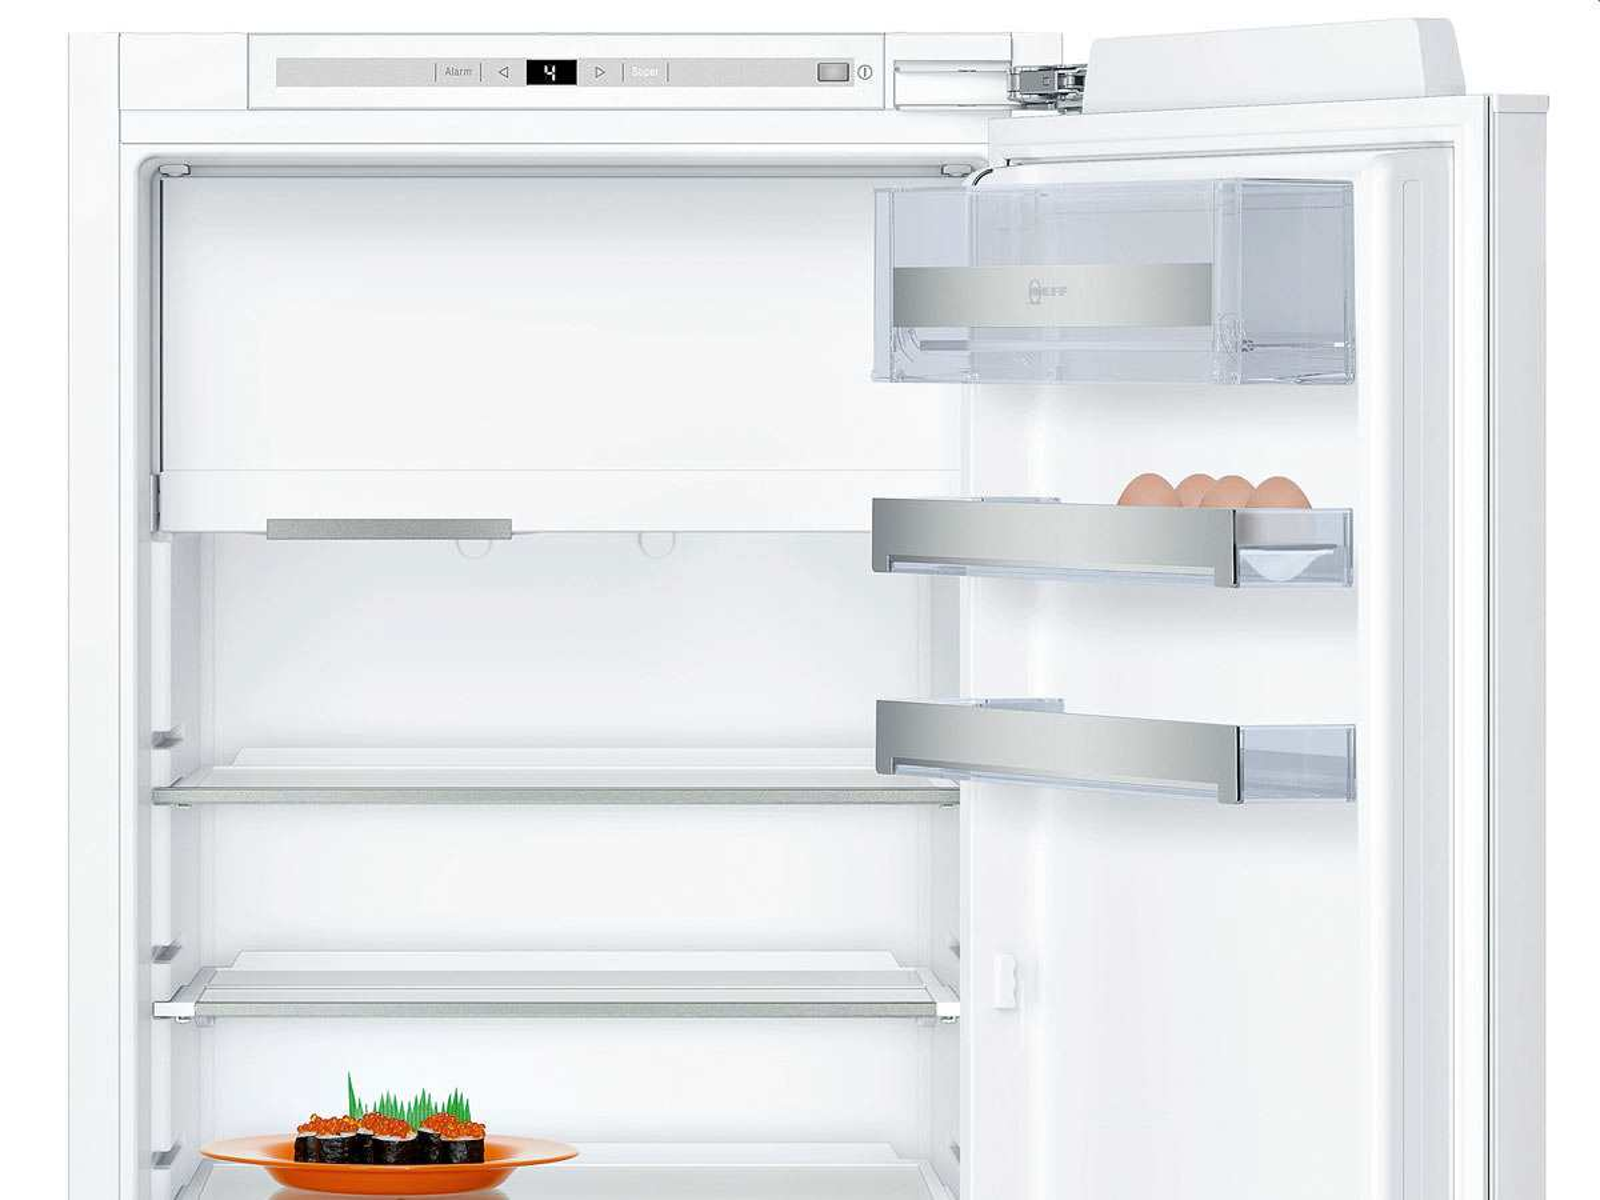 Neff K 445 A2 Einbaukühlschrank